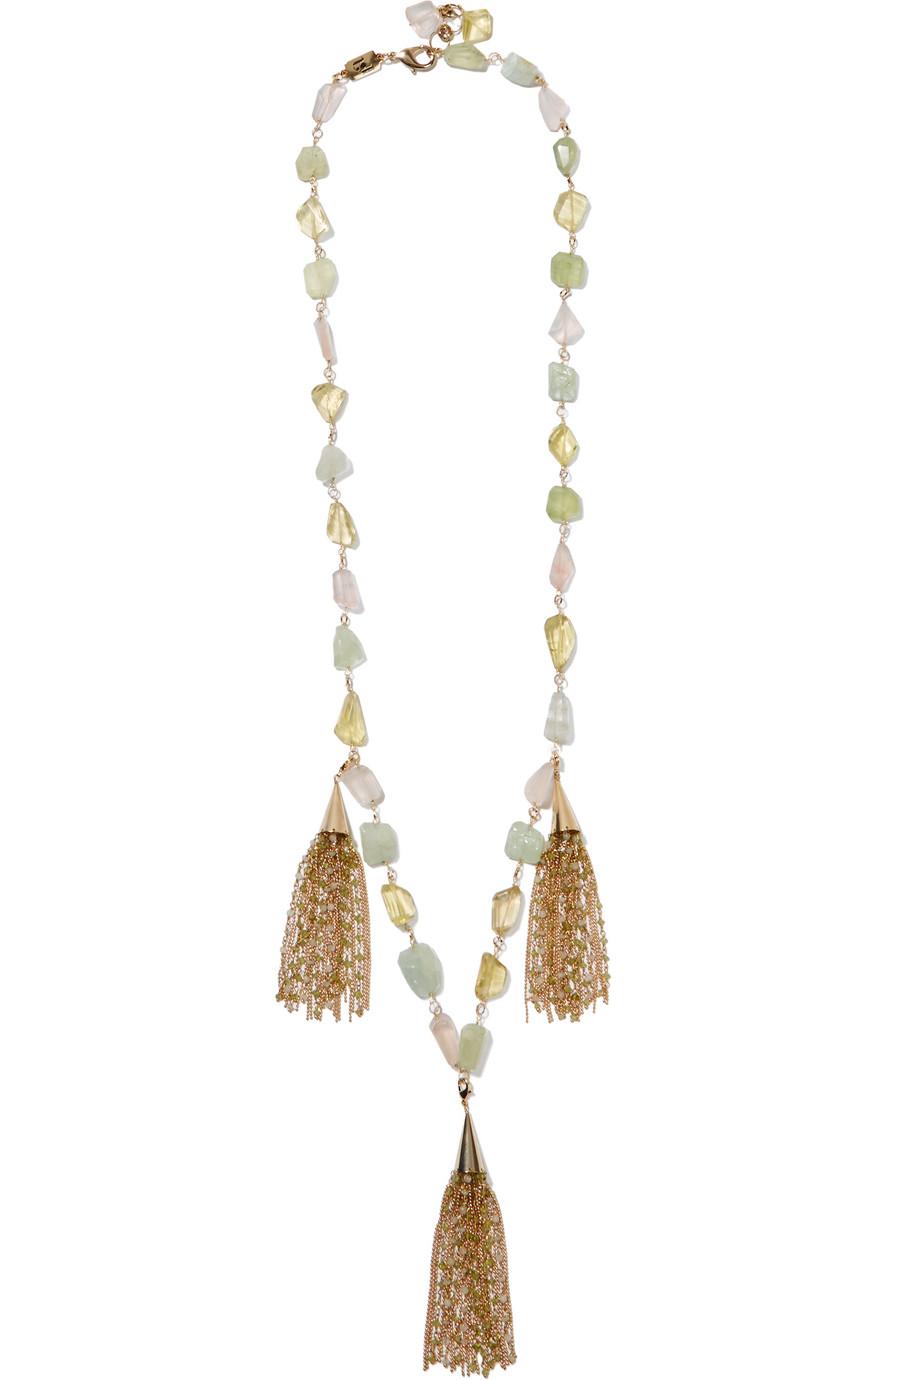 Rosantica Pastelli Gold-Tone Multi-Stone Necklace, Women's